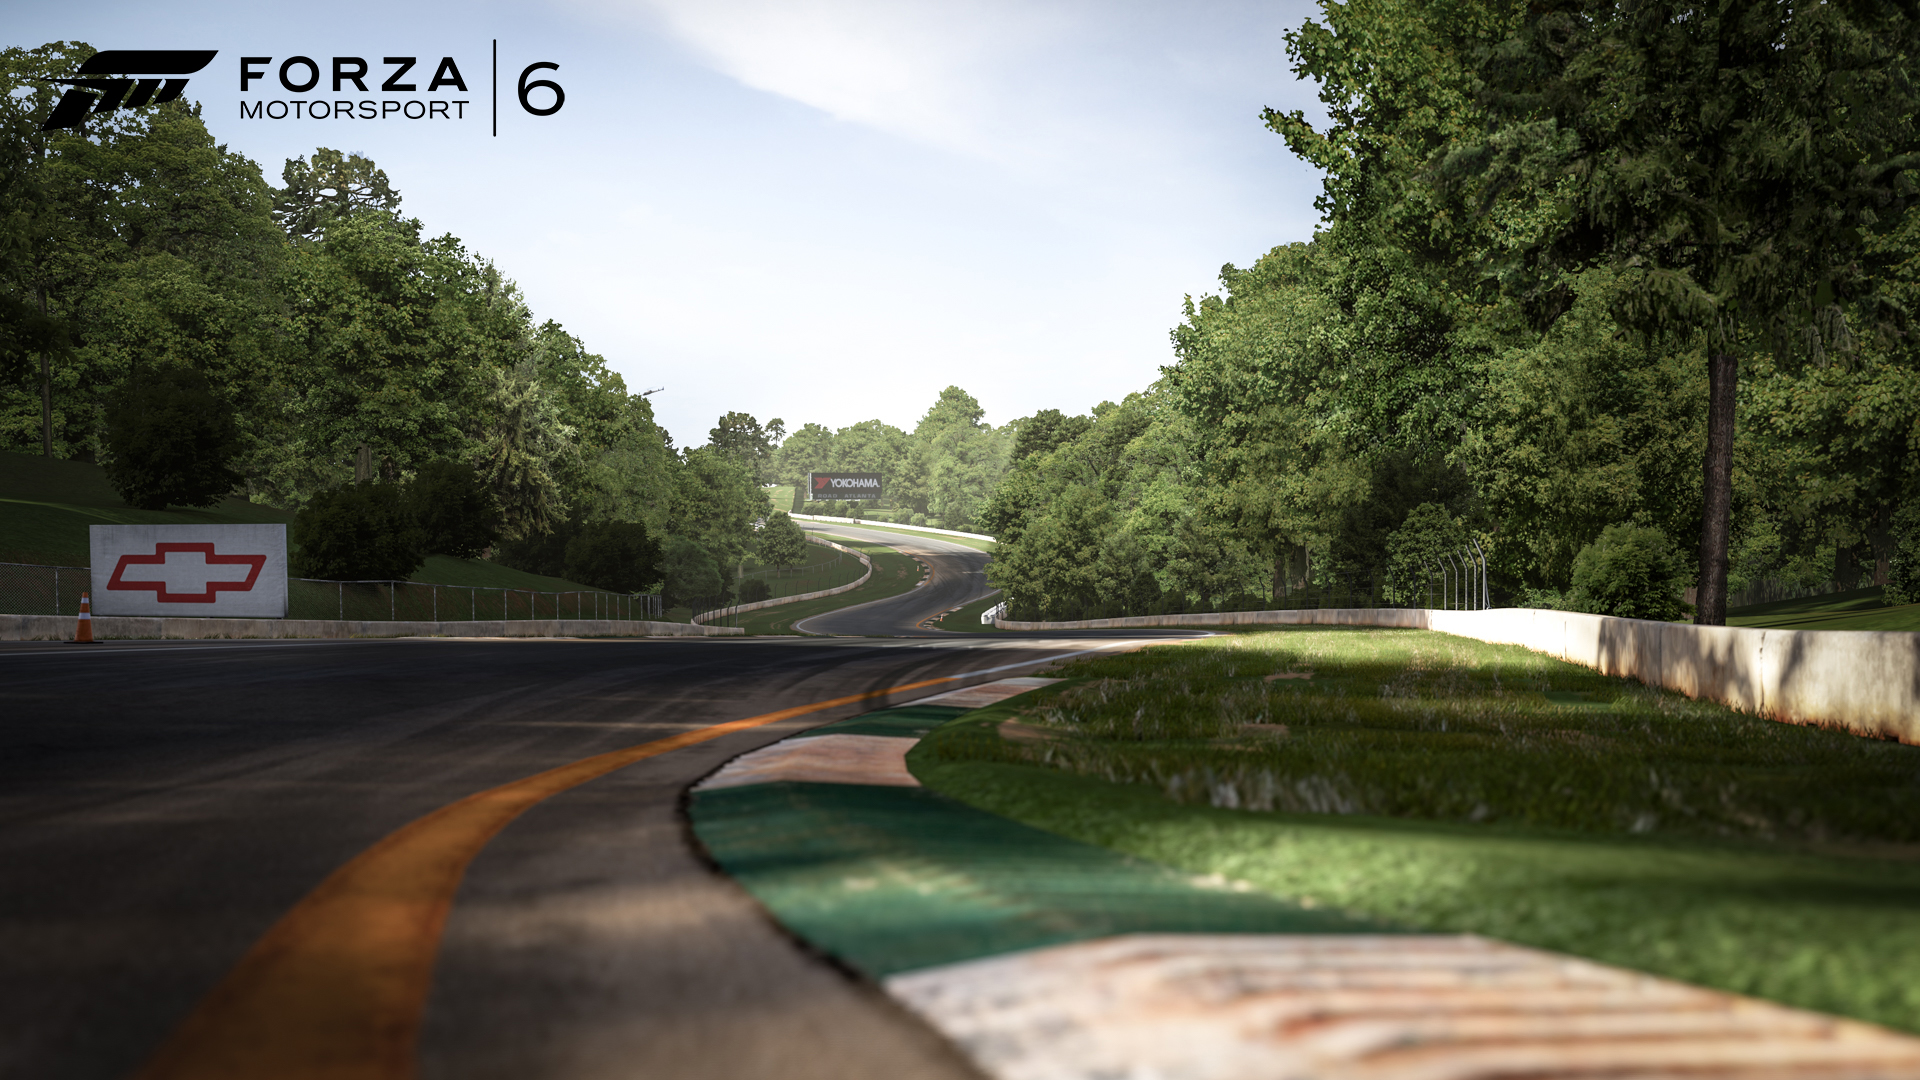 87516dfe-695c-4690-96ee-37a434488cba.jpg?n=RoadAtlantaDay_WM_Forza6 Inspiring Porsche 911 Gt1 Road atlanta Cars Trend